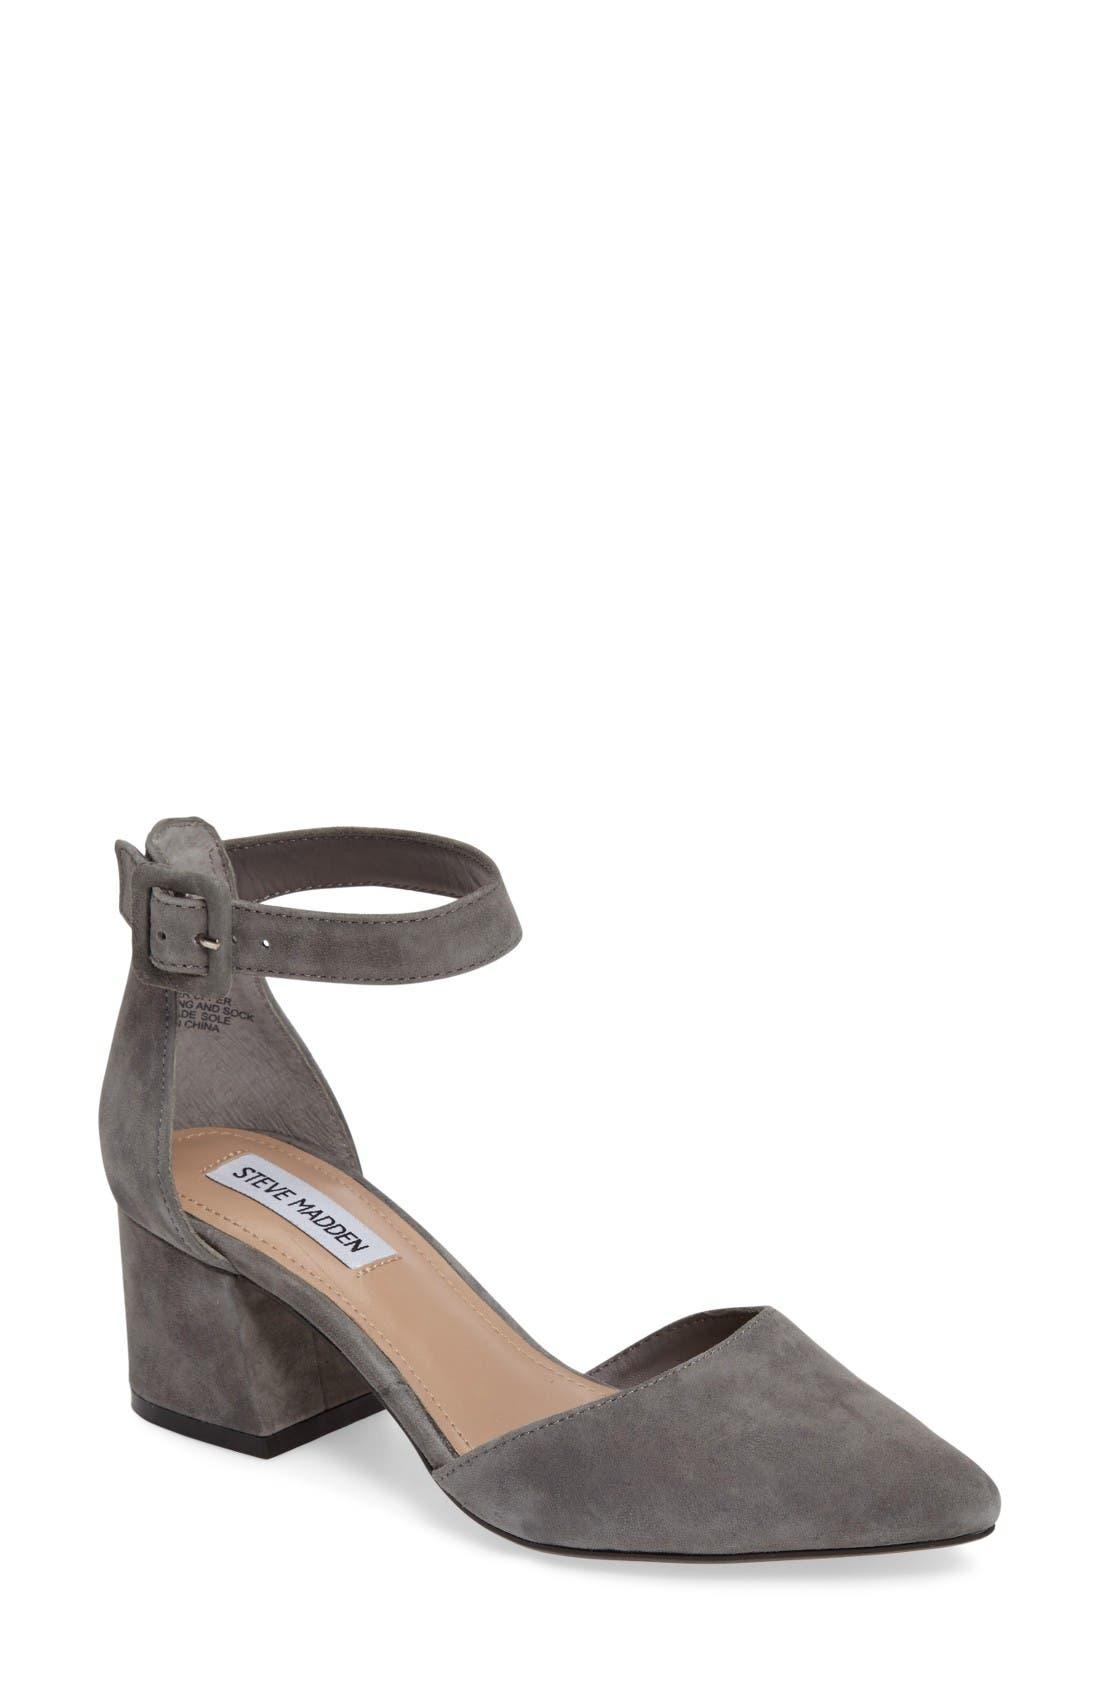 Main Image - Steve Madden Dainna d'Orsay Ankle Strap Pump (Women)